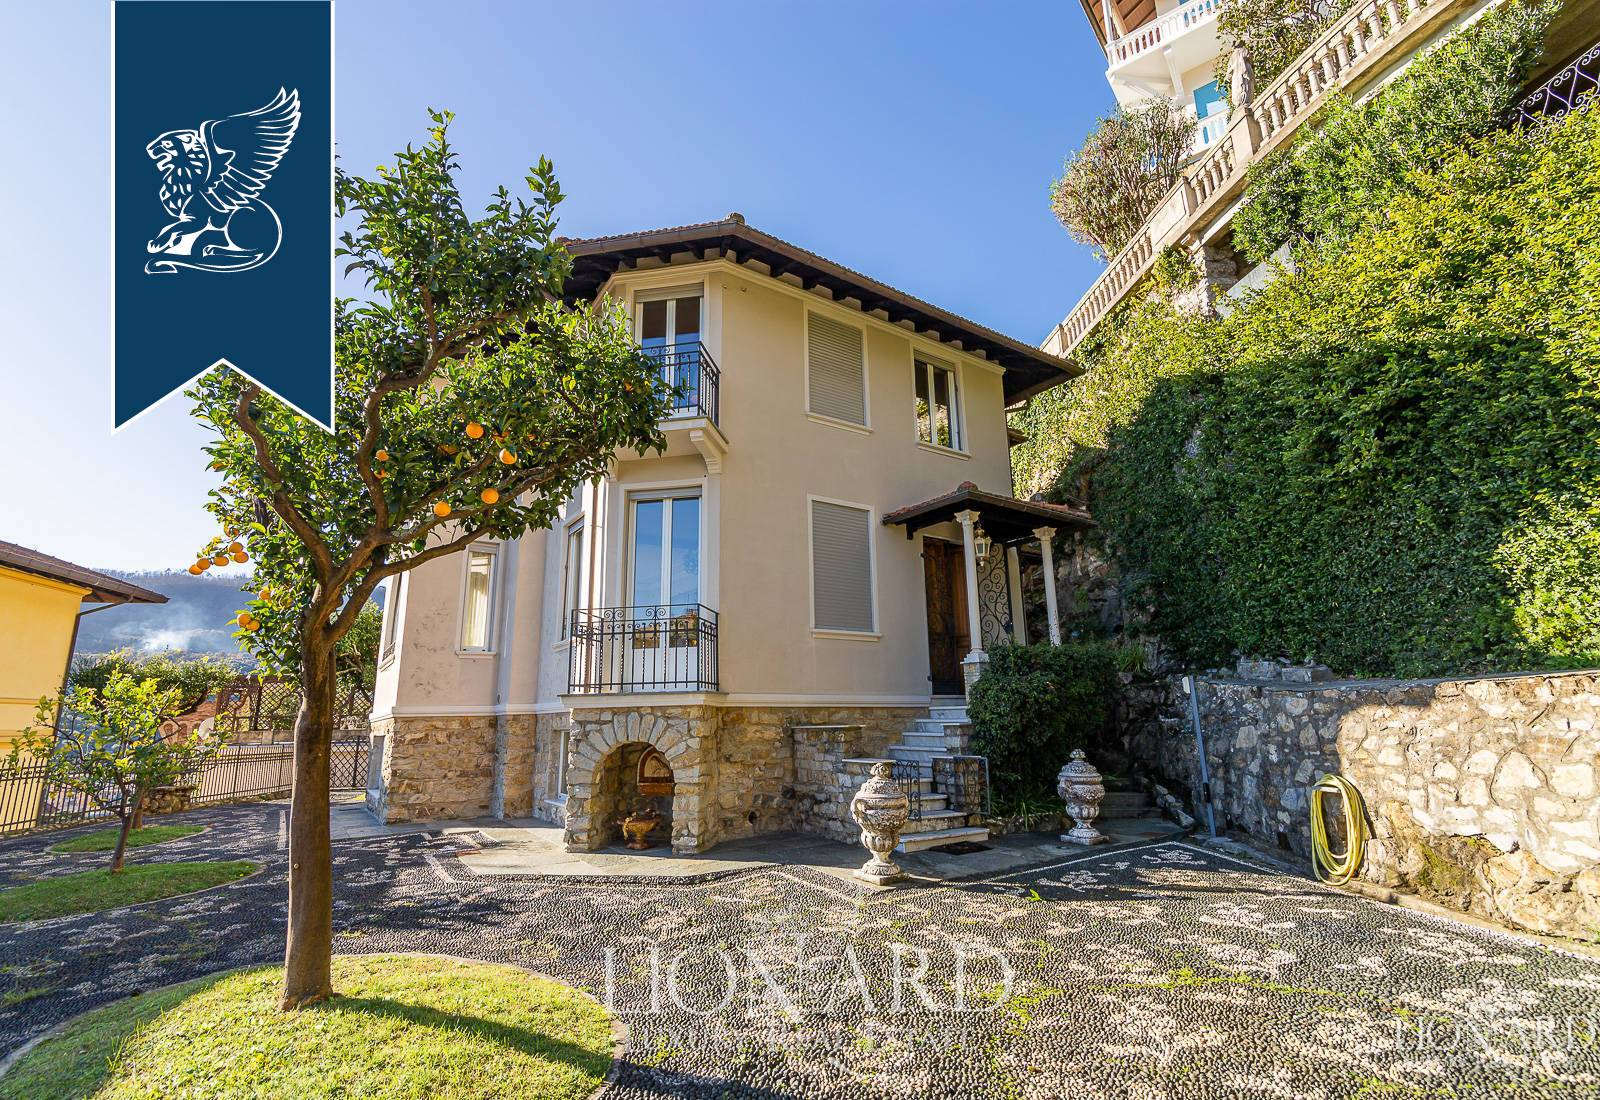 Villa in Vendita a Santa Margherita Ligure: 0 locali, 350 mq - Foto 6